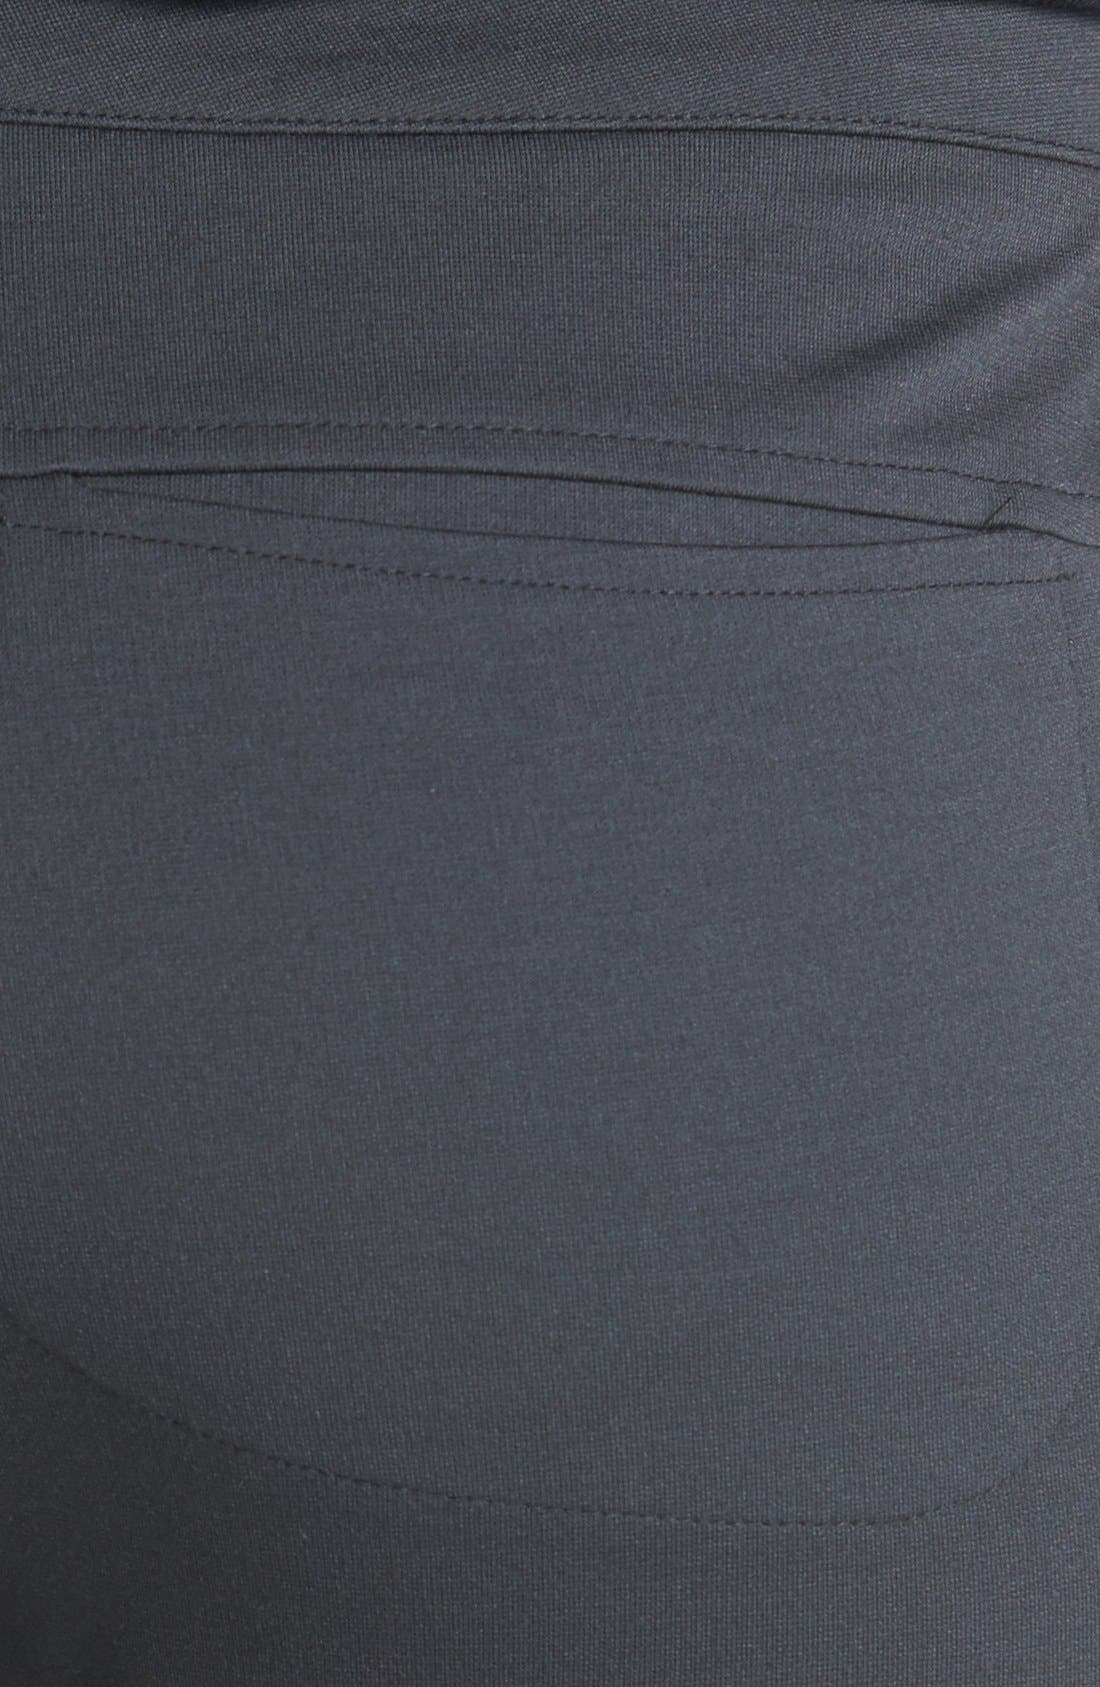 Alternate Image 3  - Vince 'Ski' Ponte Pants